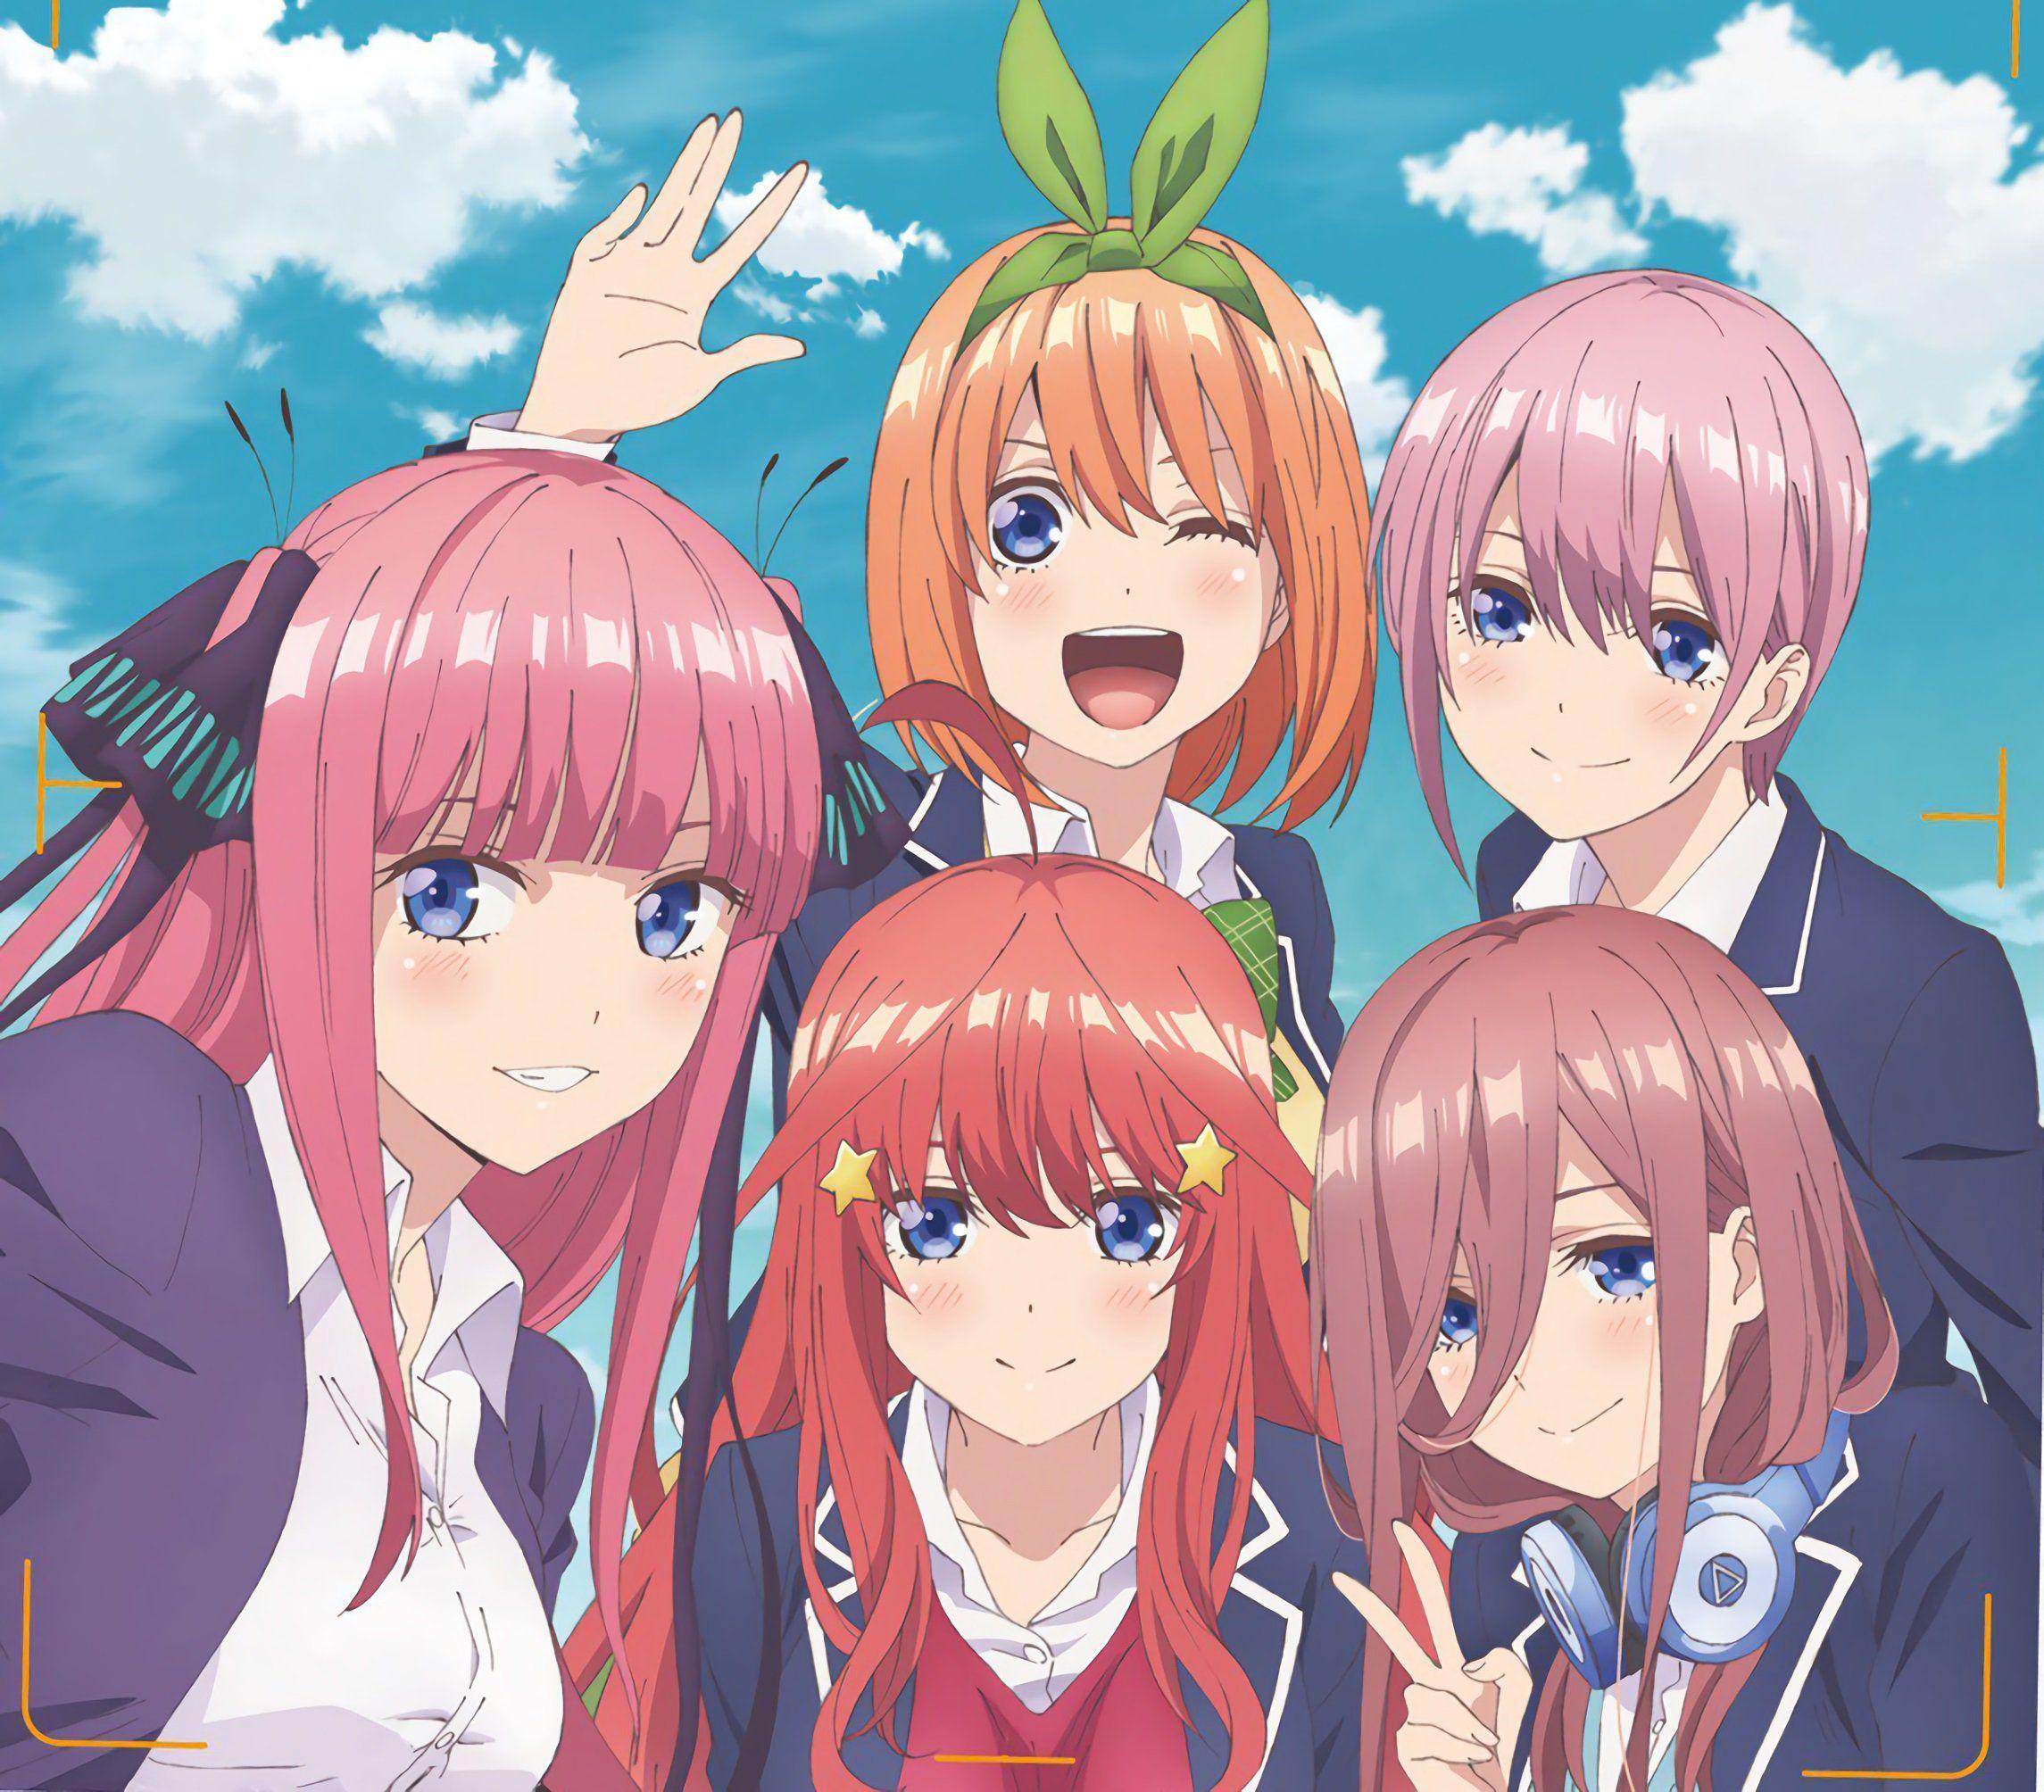 Pragmático Holdings on in 2020 Anime best friends, Anime